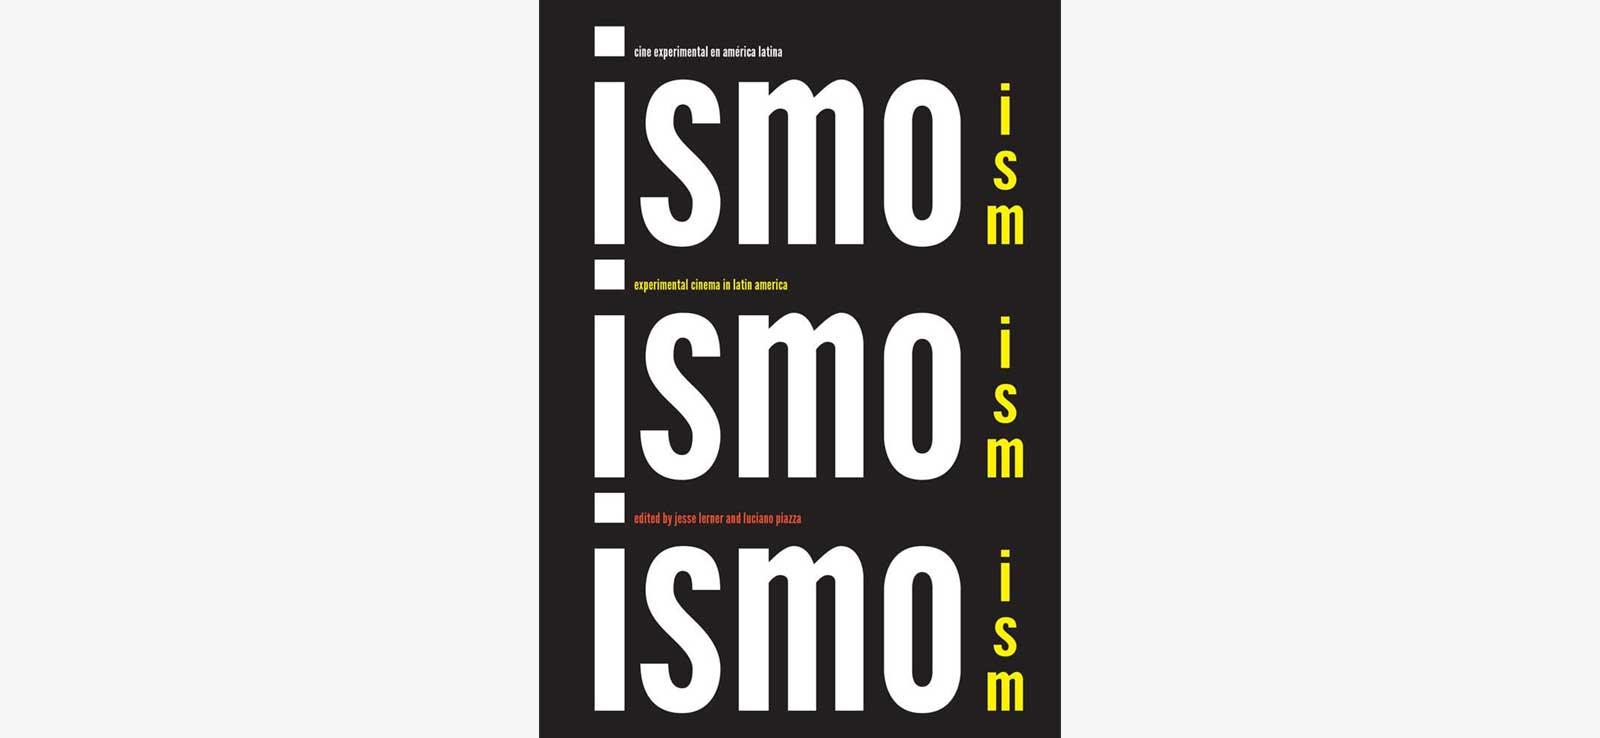 Antoni-Pinent-curator-exhibition-experimental-film-america-latina-Ism-Ism-Ism